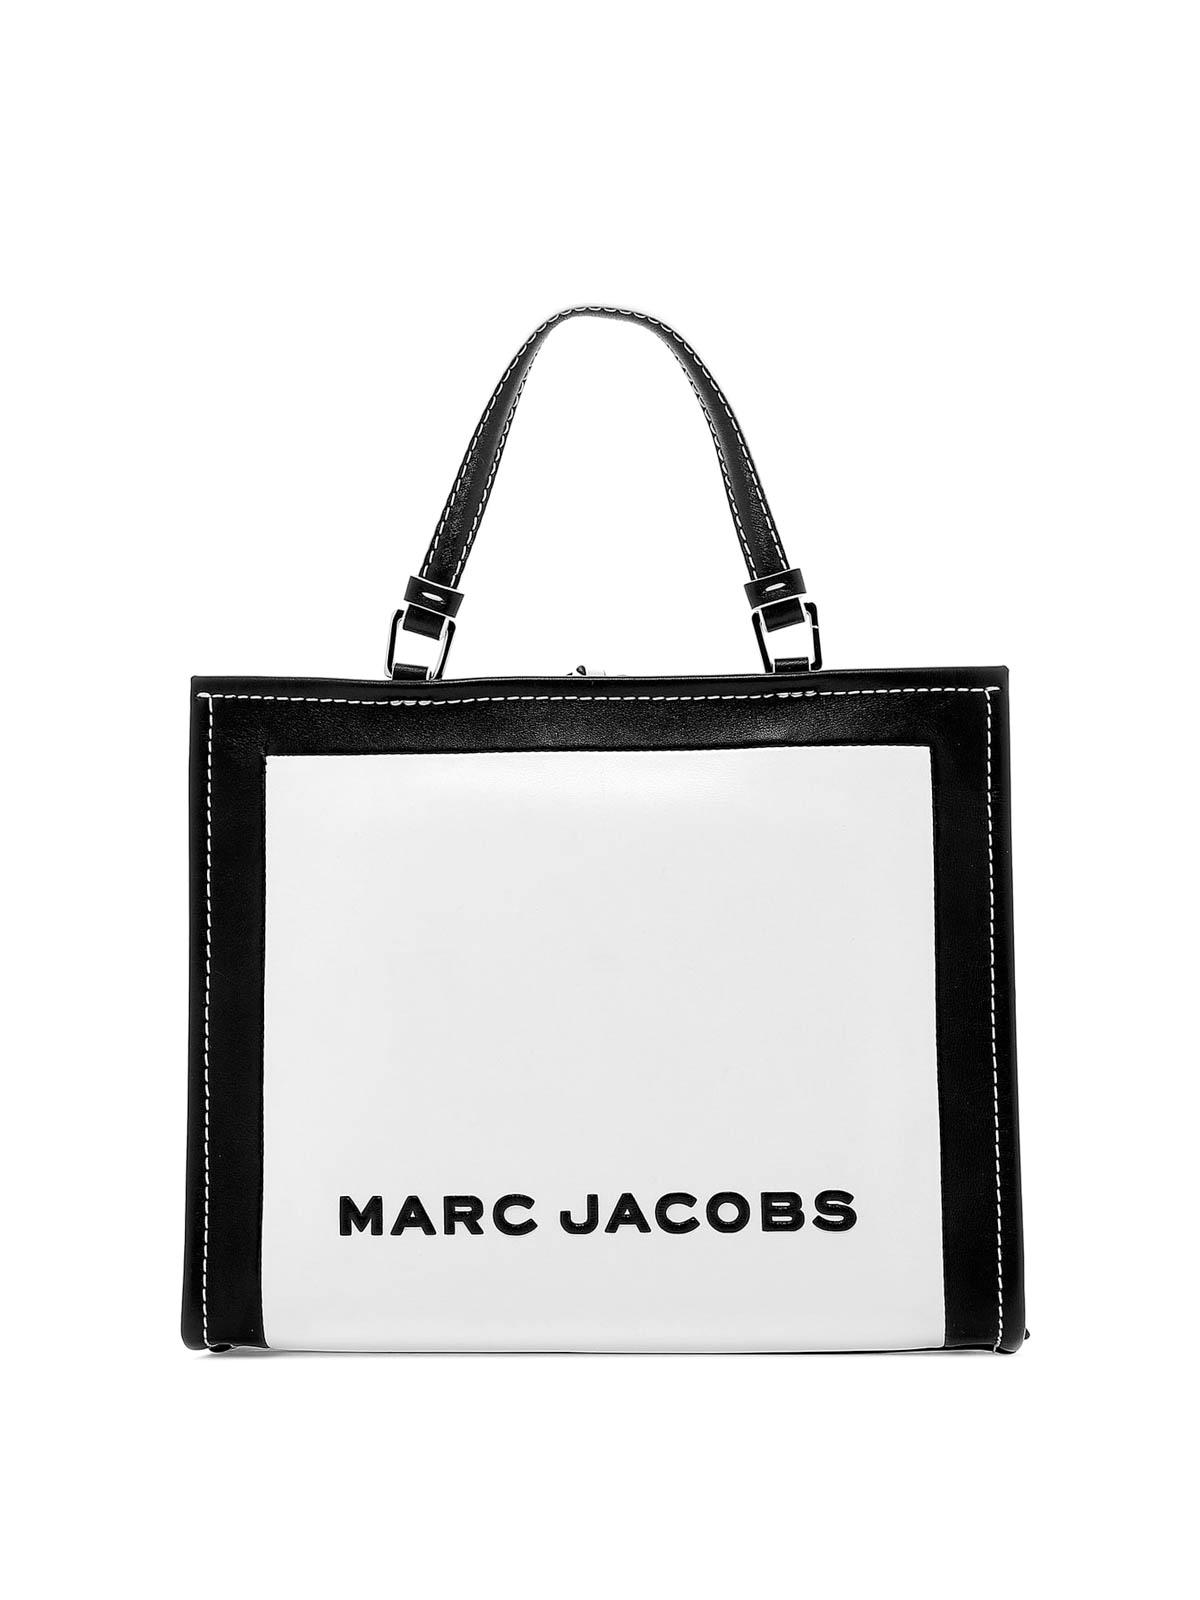 Marc Jacobs - Sac Cabas - The Box 29 - Sacs à main - M0014537164